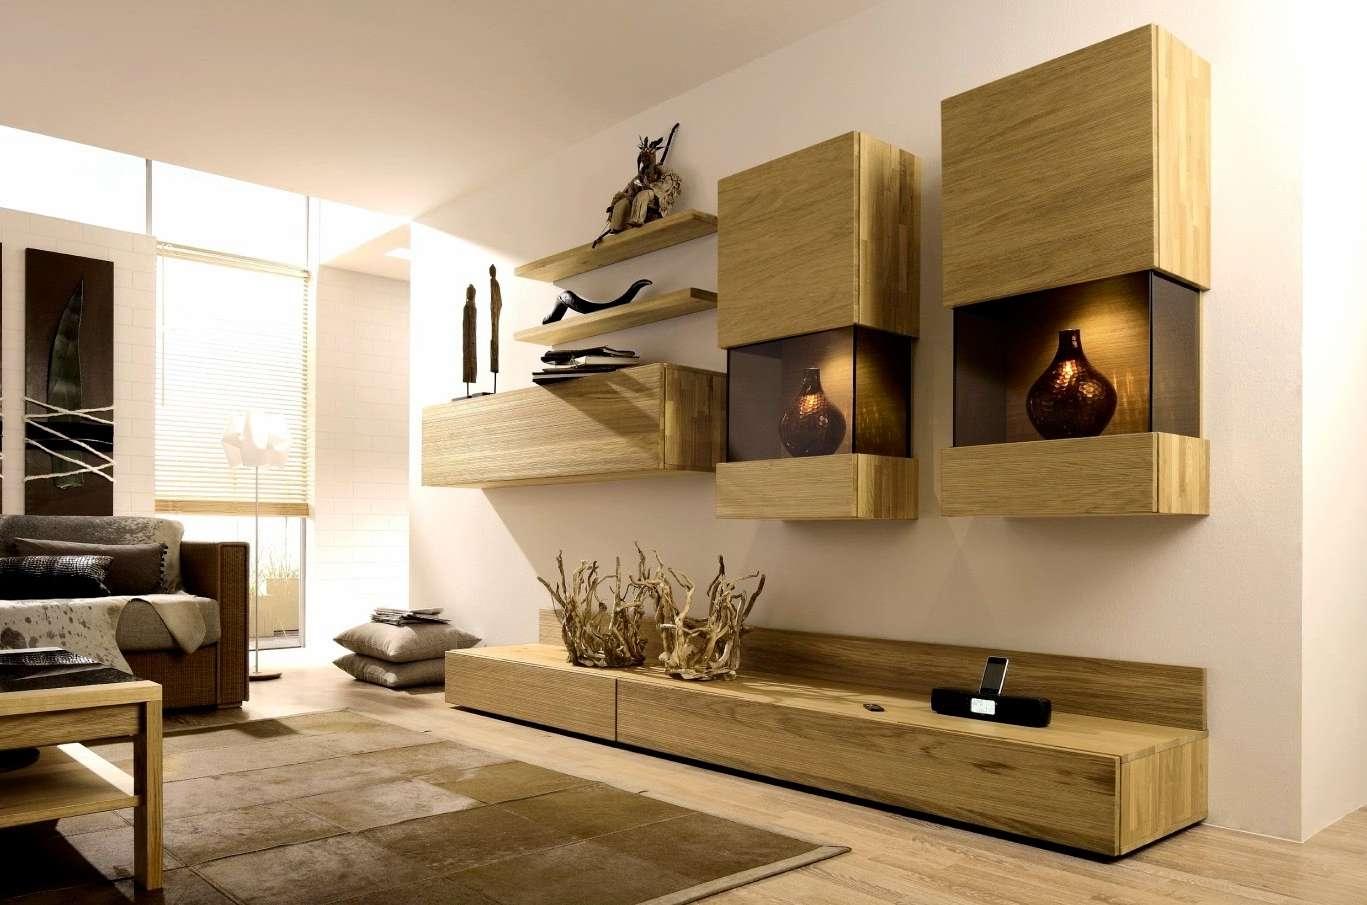 Living Room Tv Cabinet Designs Adorable Design – Pjamteen With Regard To Living Room Tv Cabinets (View 16 of 20)